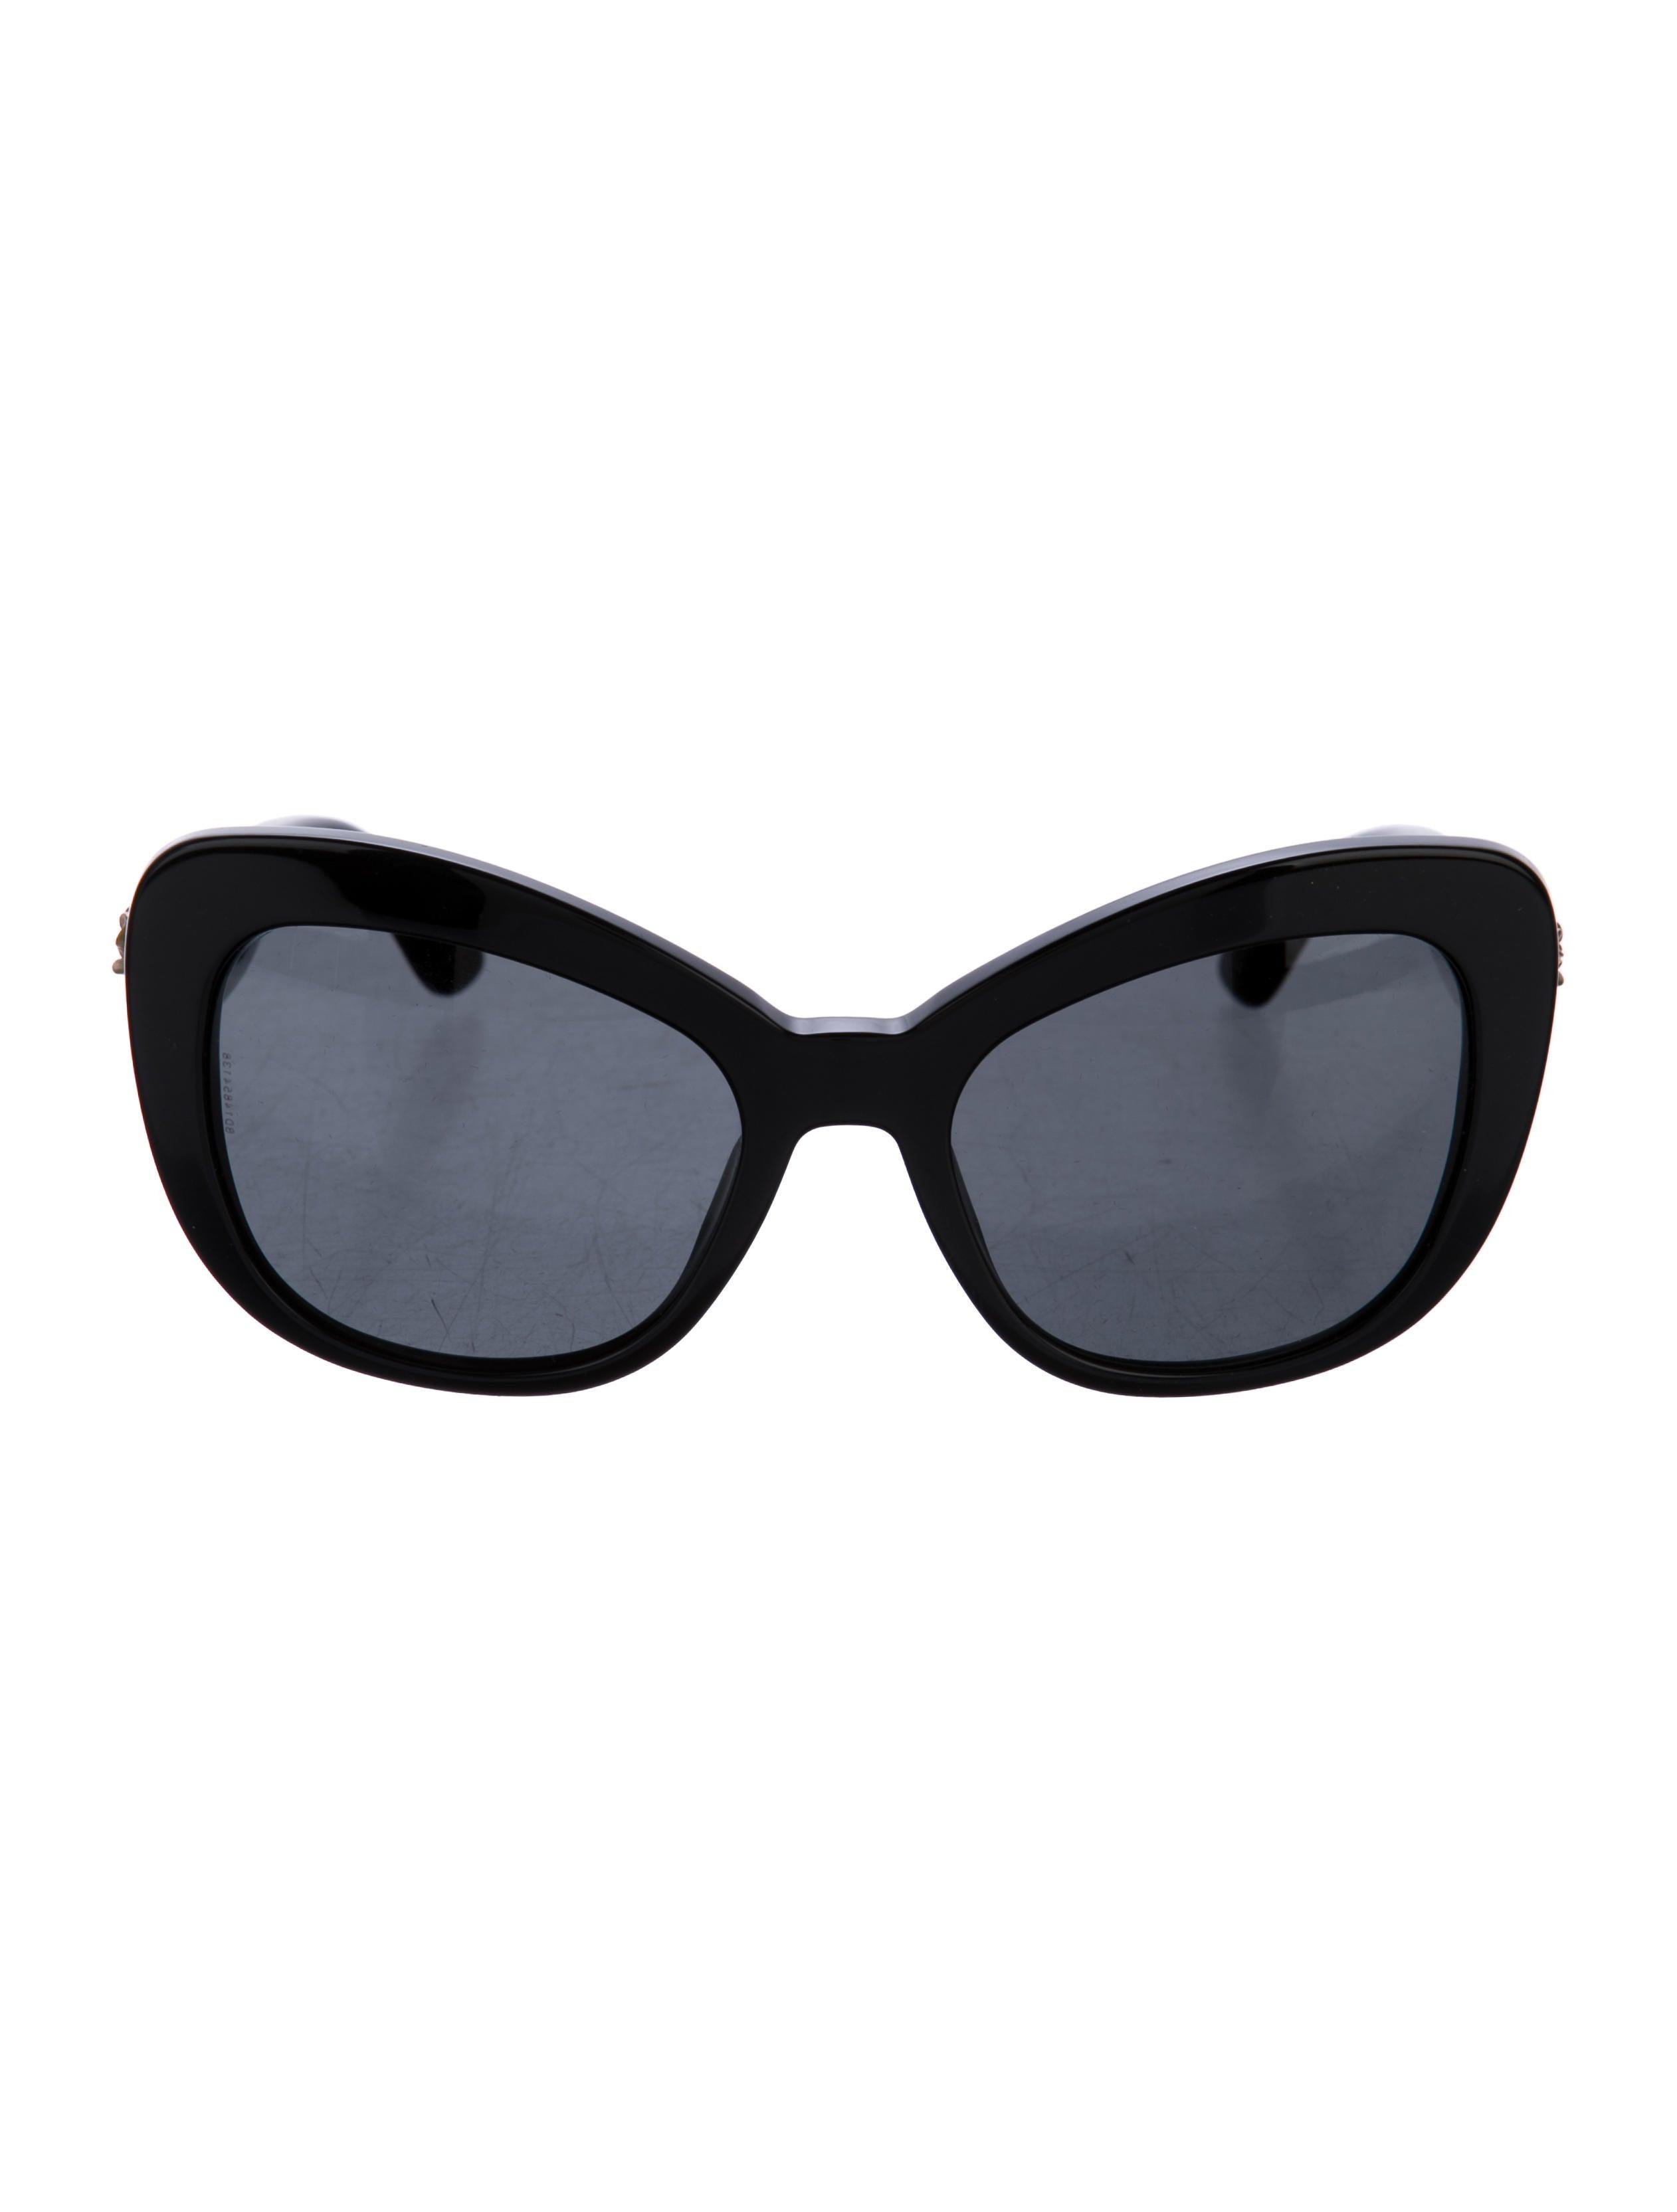 a2d038c9b1963 Dolce   Gabbana Almond Flowers Cat-Eye Sunglasses - Accessories - DAG92865